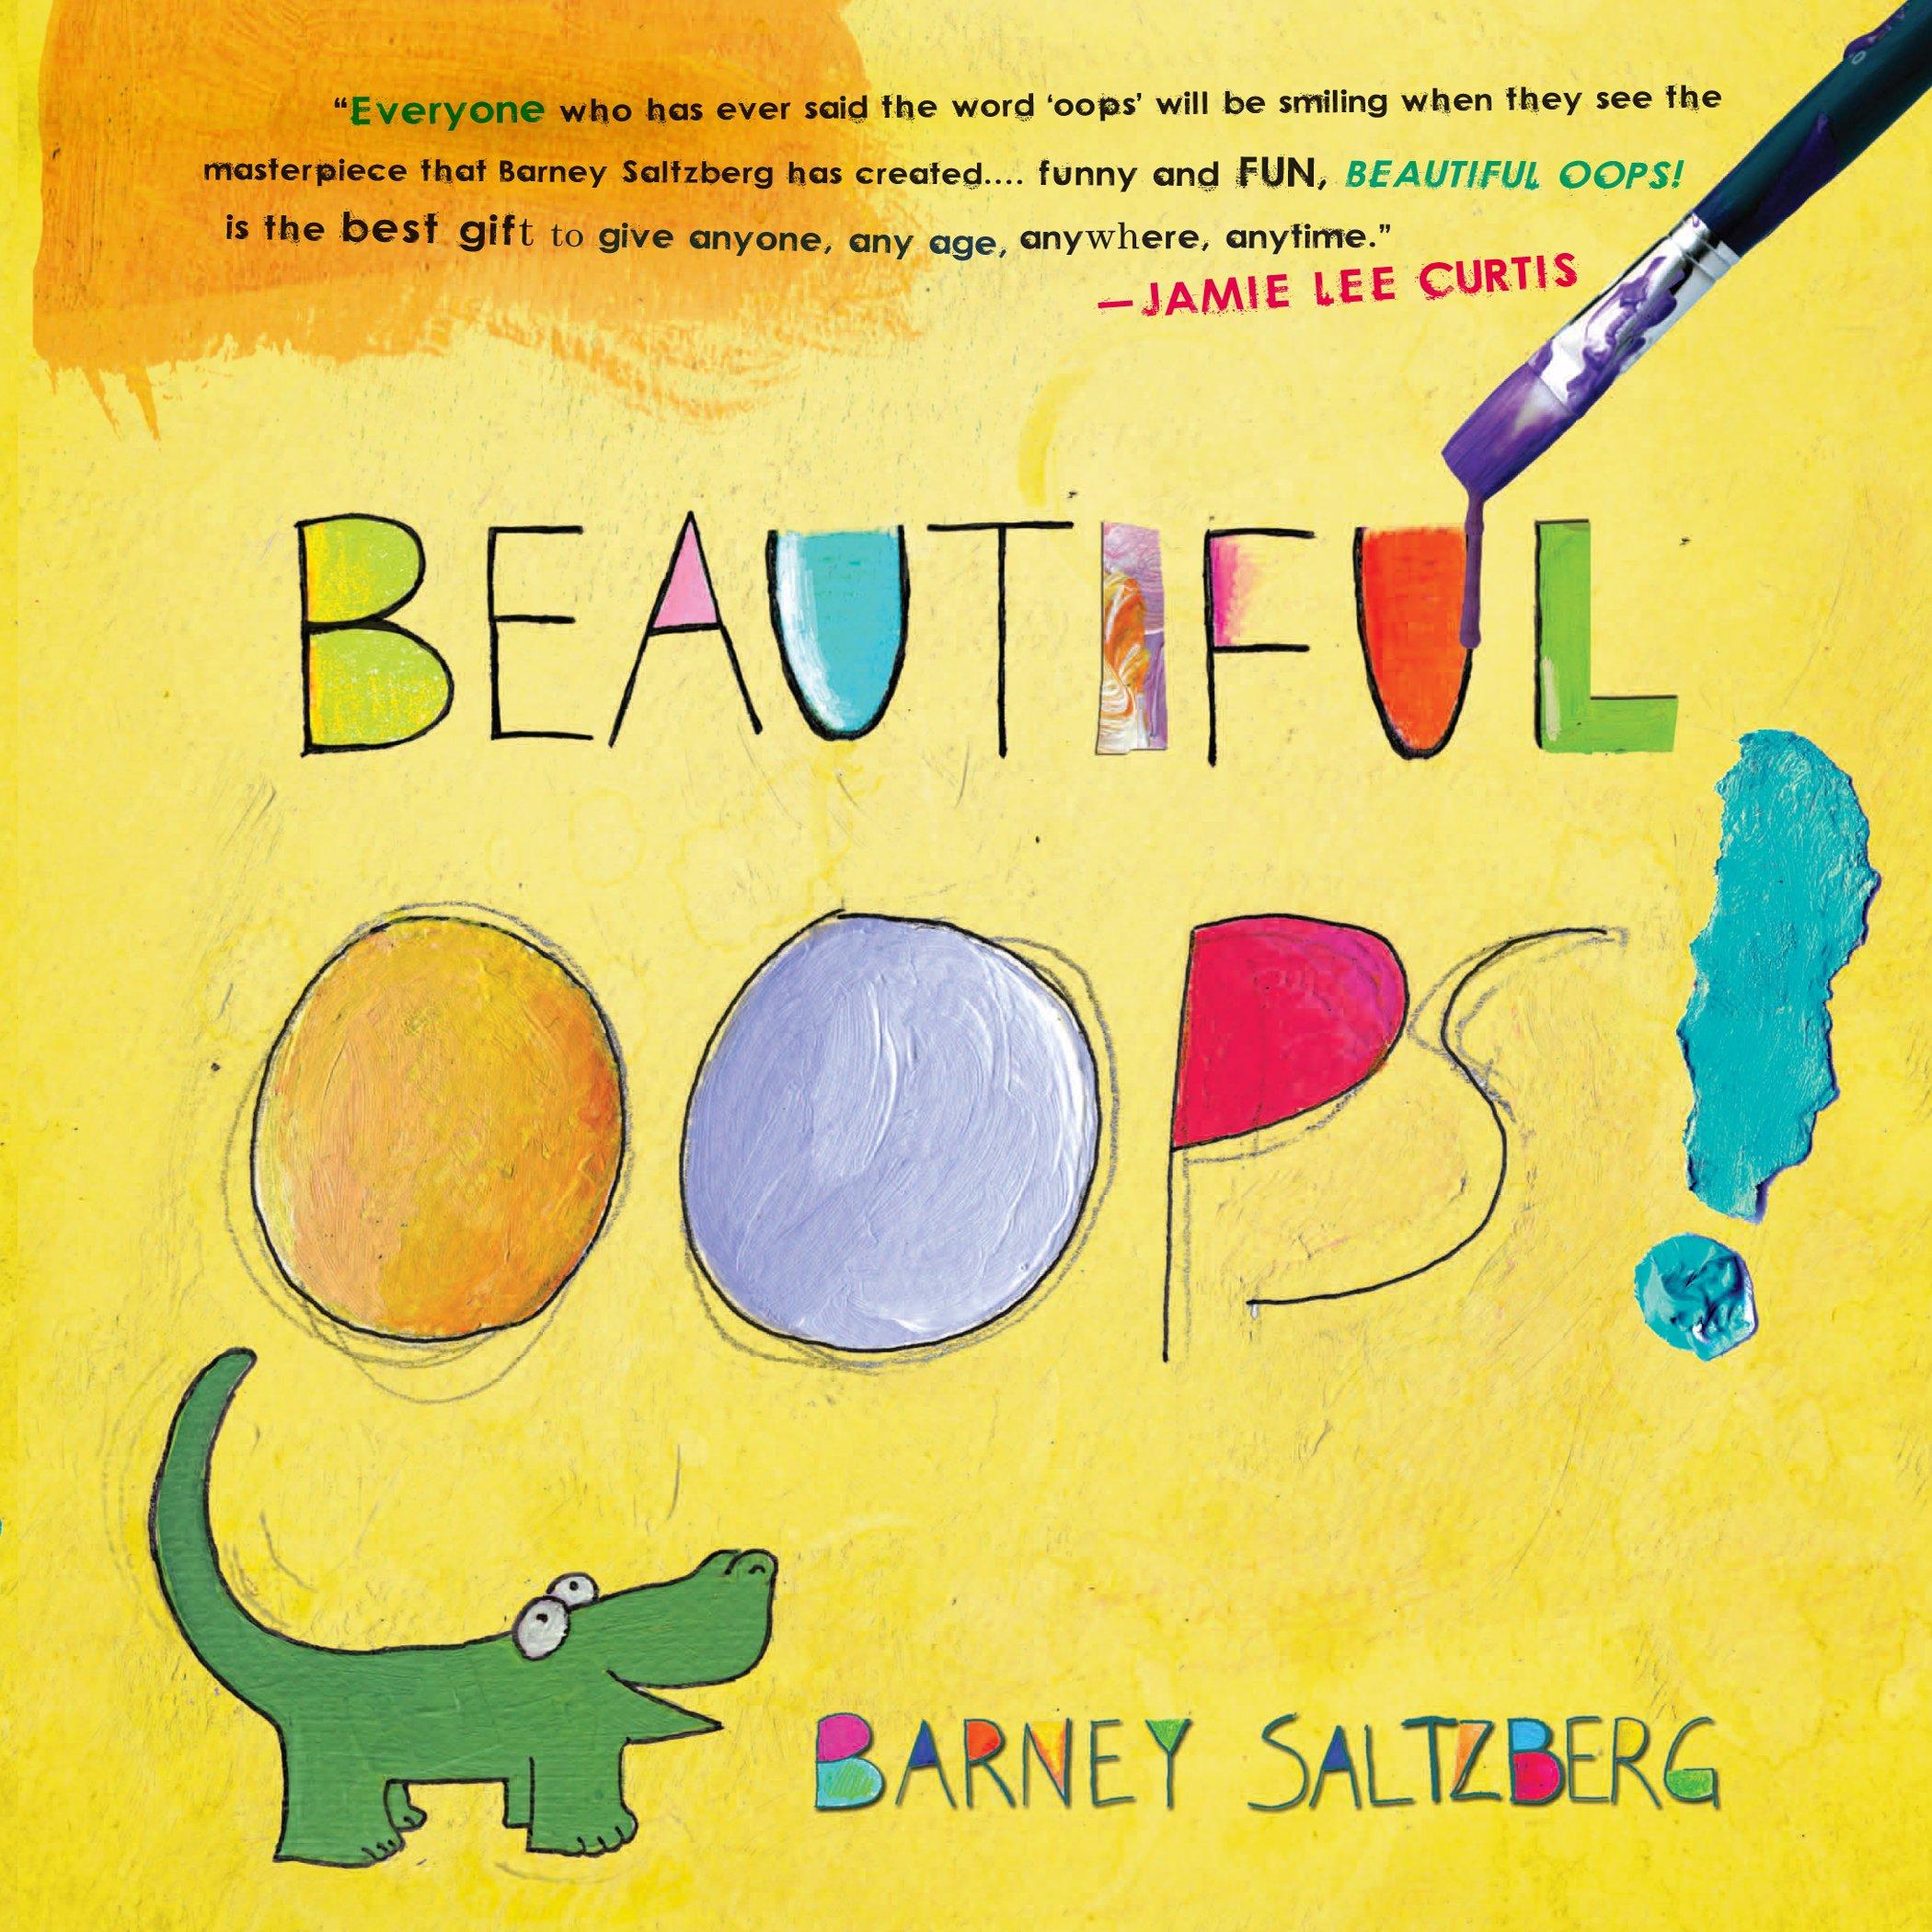 Beautiful Oops Barney Saltzberg product image